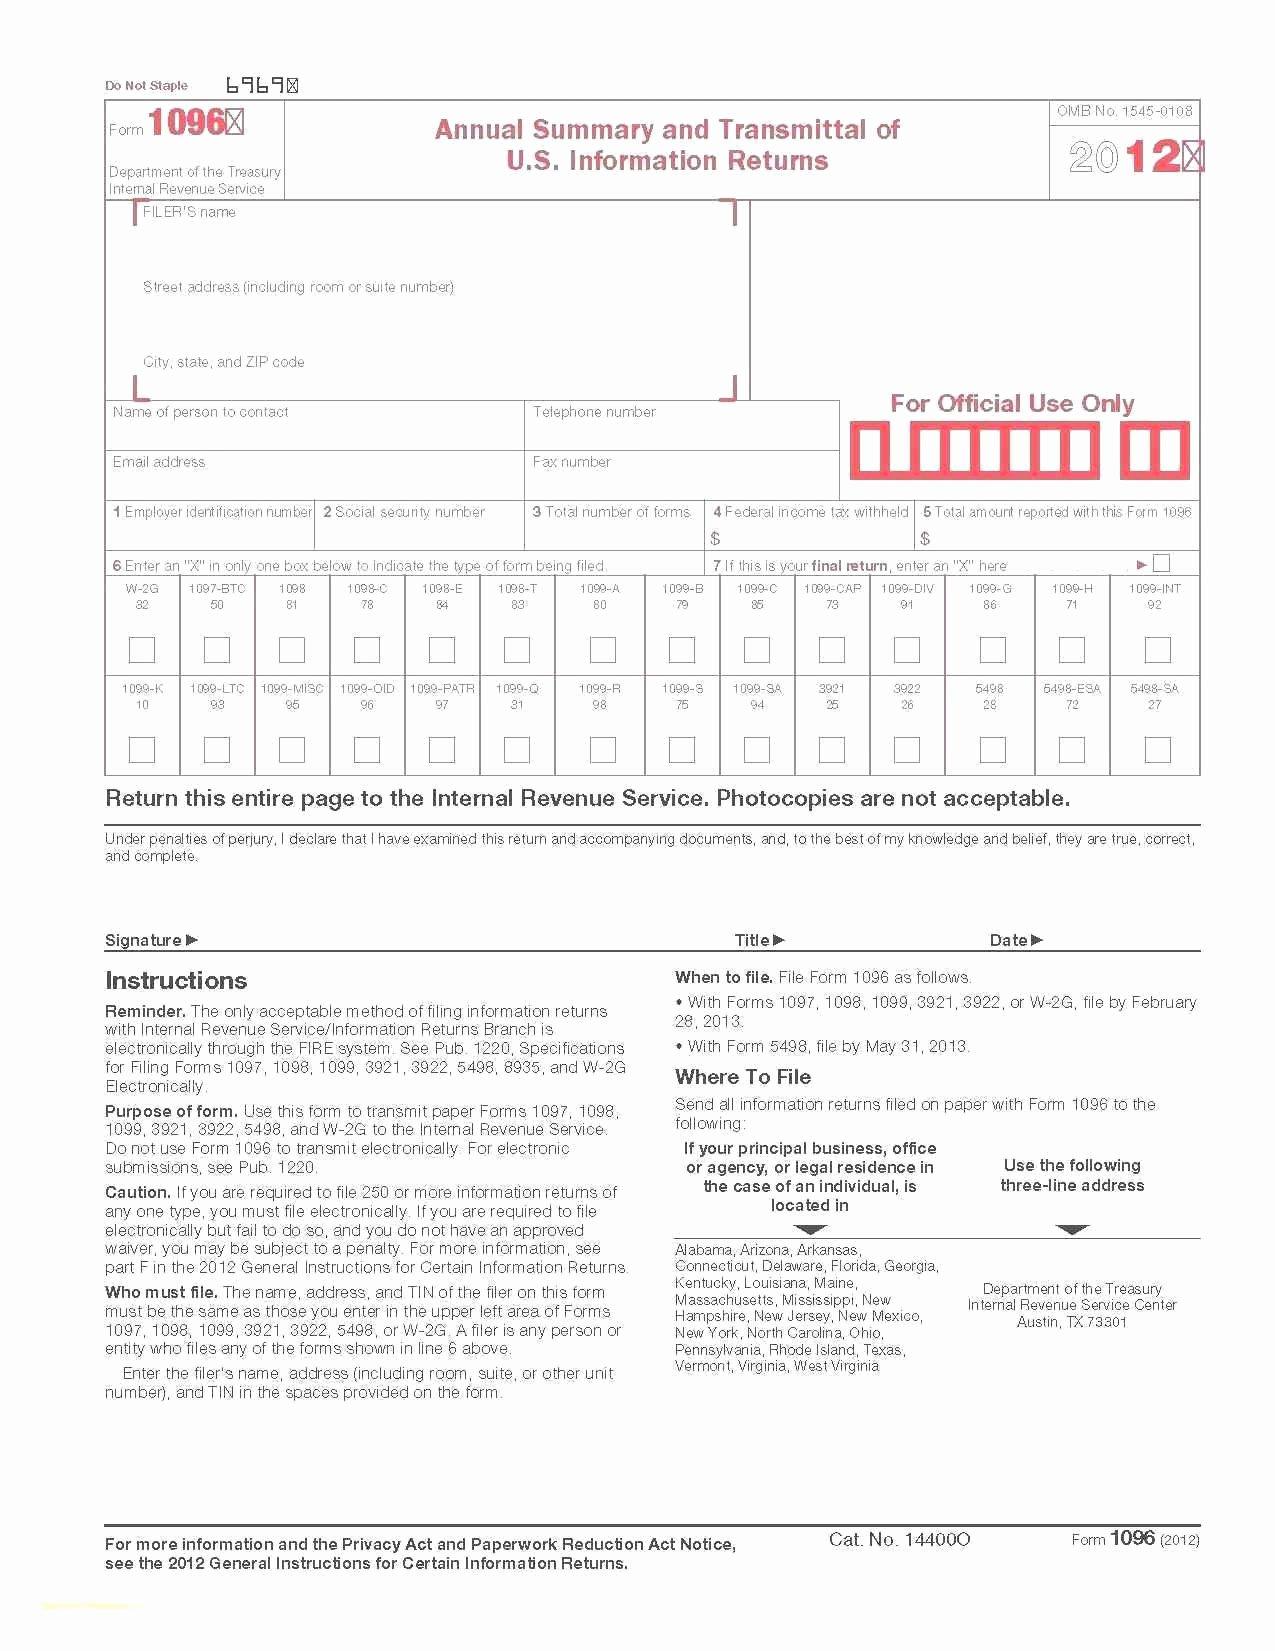 Construction Transmittal form Fresh New Memorandum Understanding Template Construction